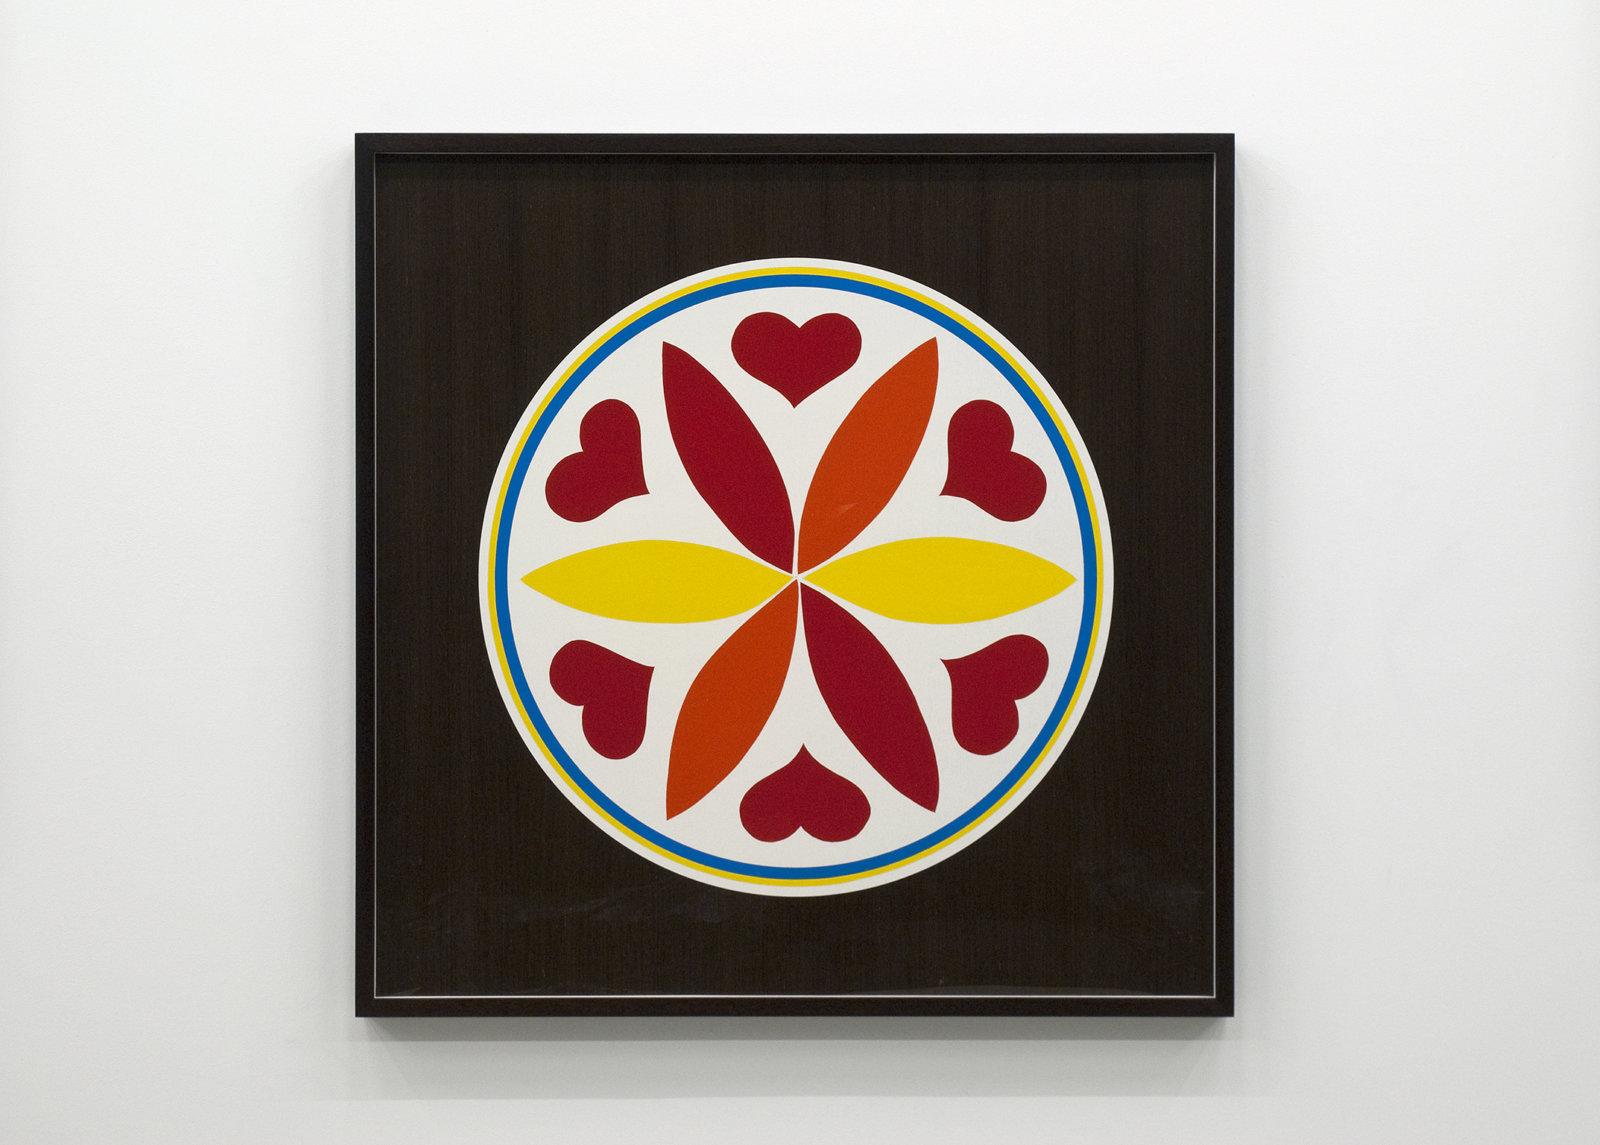 Myfanwy MacLeod, Hex IV, 2009, enamel on wood, 48 x 48 in. (122 x 122 cm) by Myfanwy MacLeod